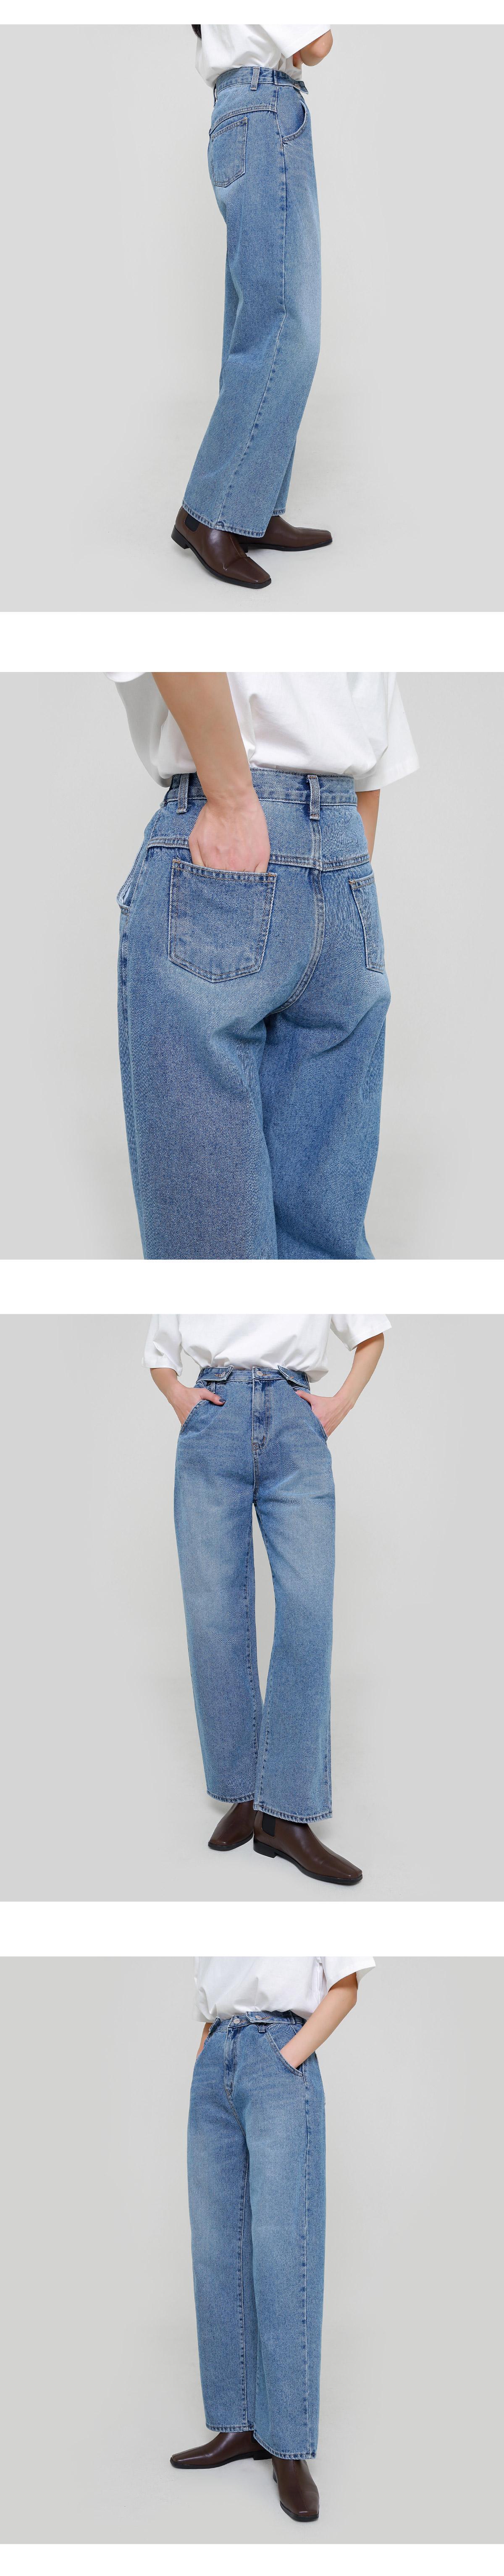 Bunny bijo pants